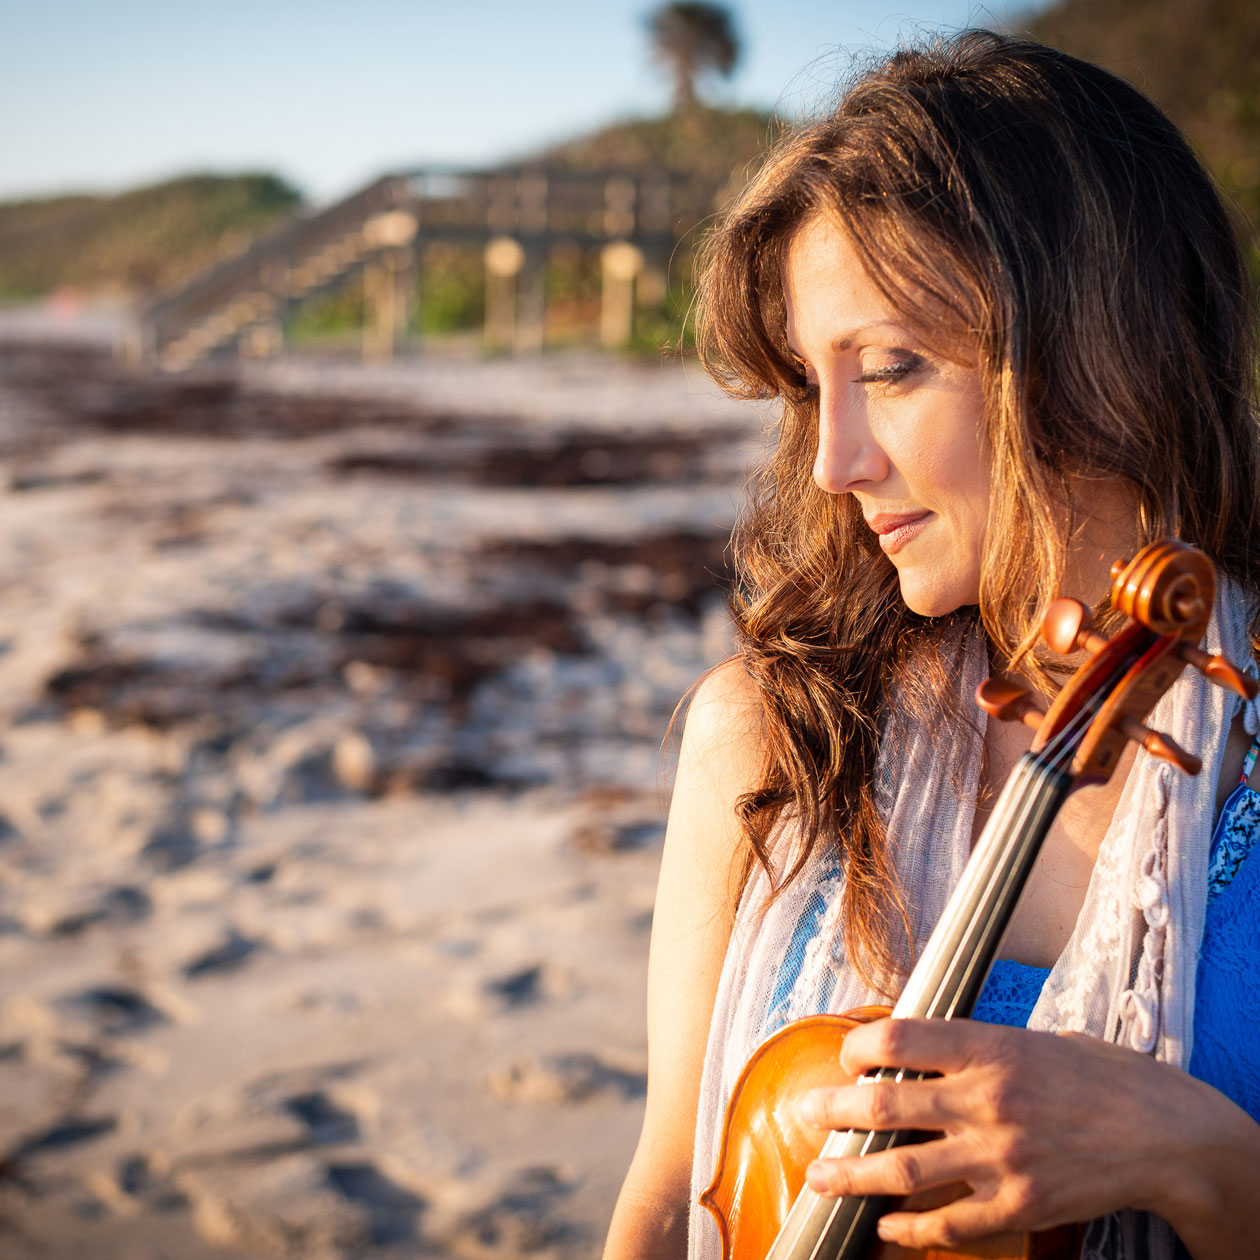 Mariana Sunset Violinist #3